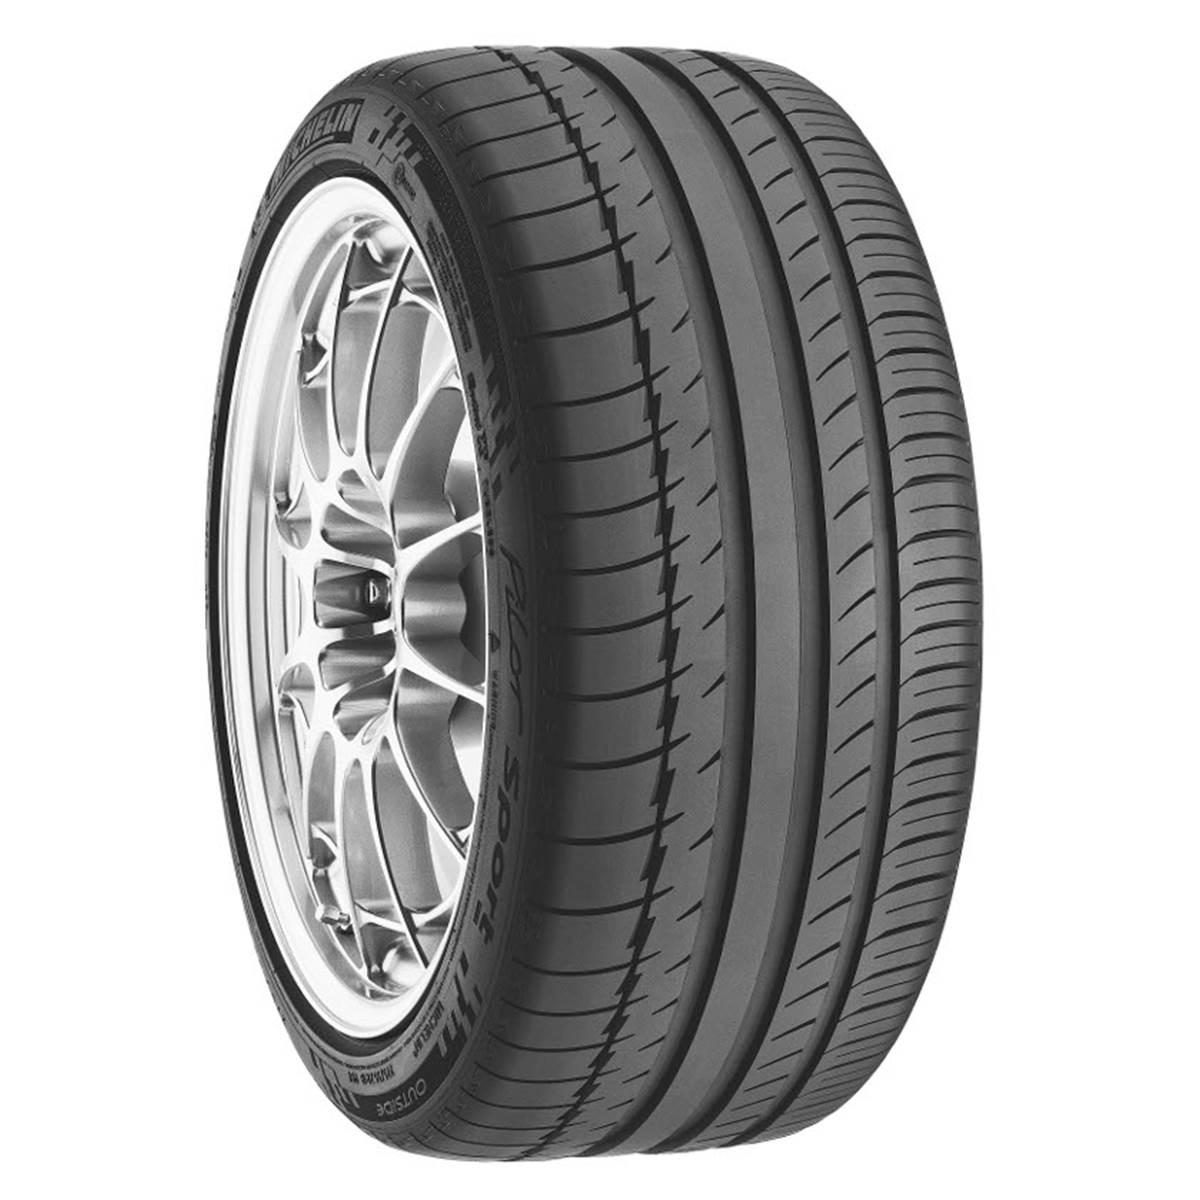 Pneu Michelin 275/35R19 100Y Pilot Sport Ps2 XL